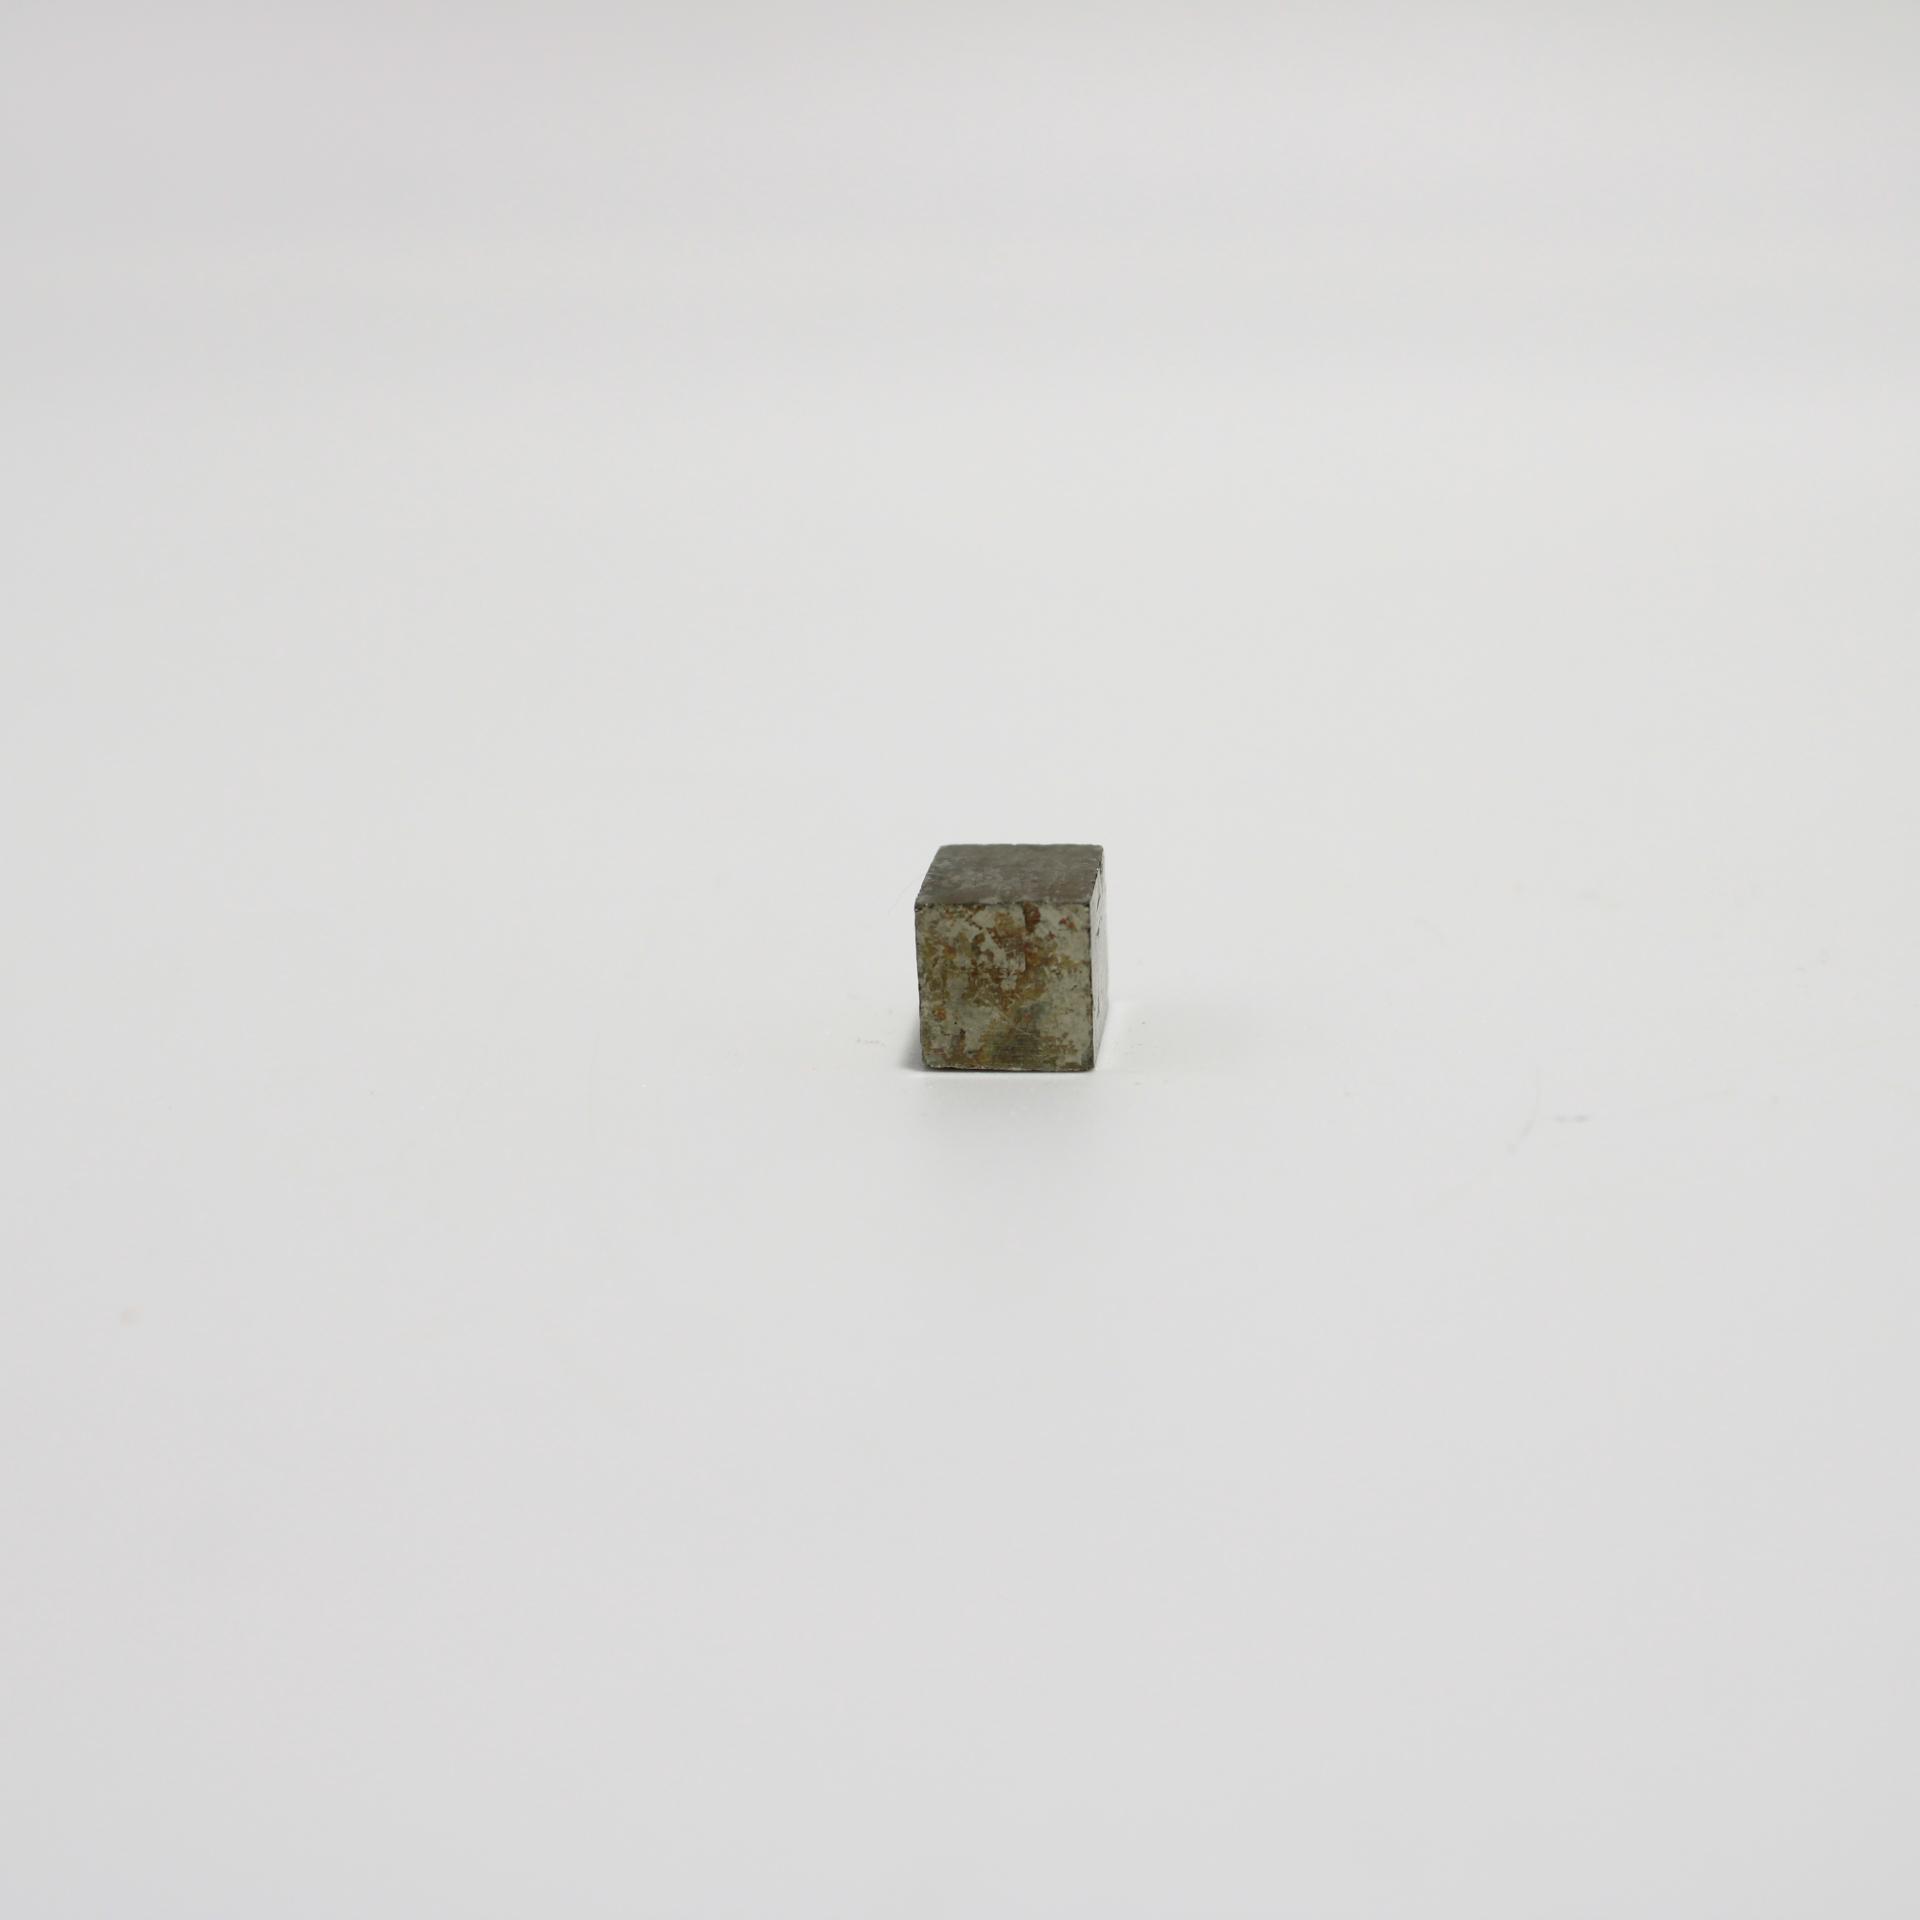 I73 pyritecube 4